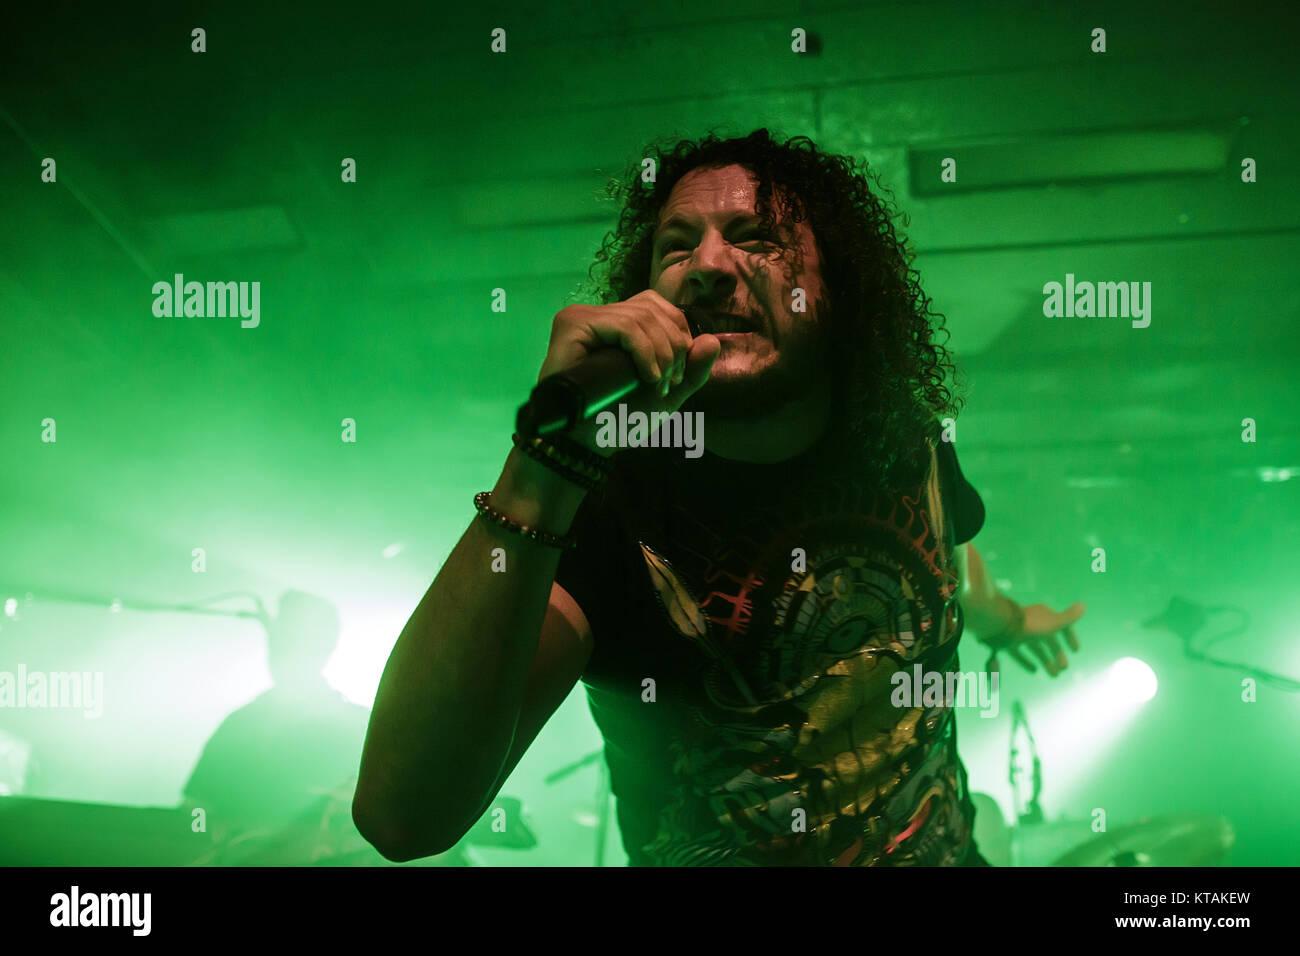 The British Progressive Metal Band Haken Performs A Live Concert At